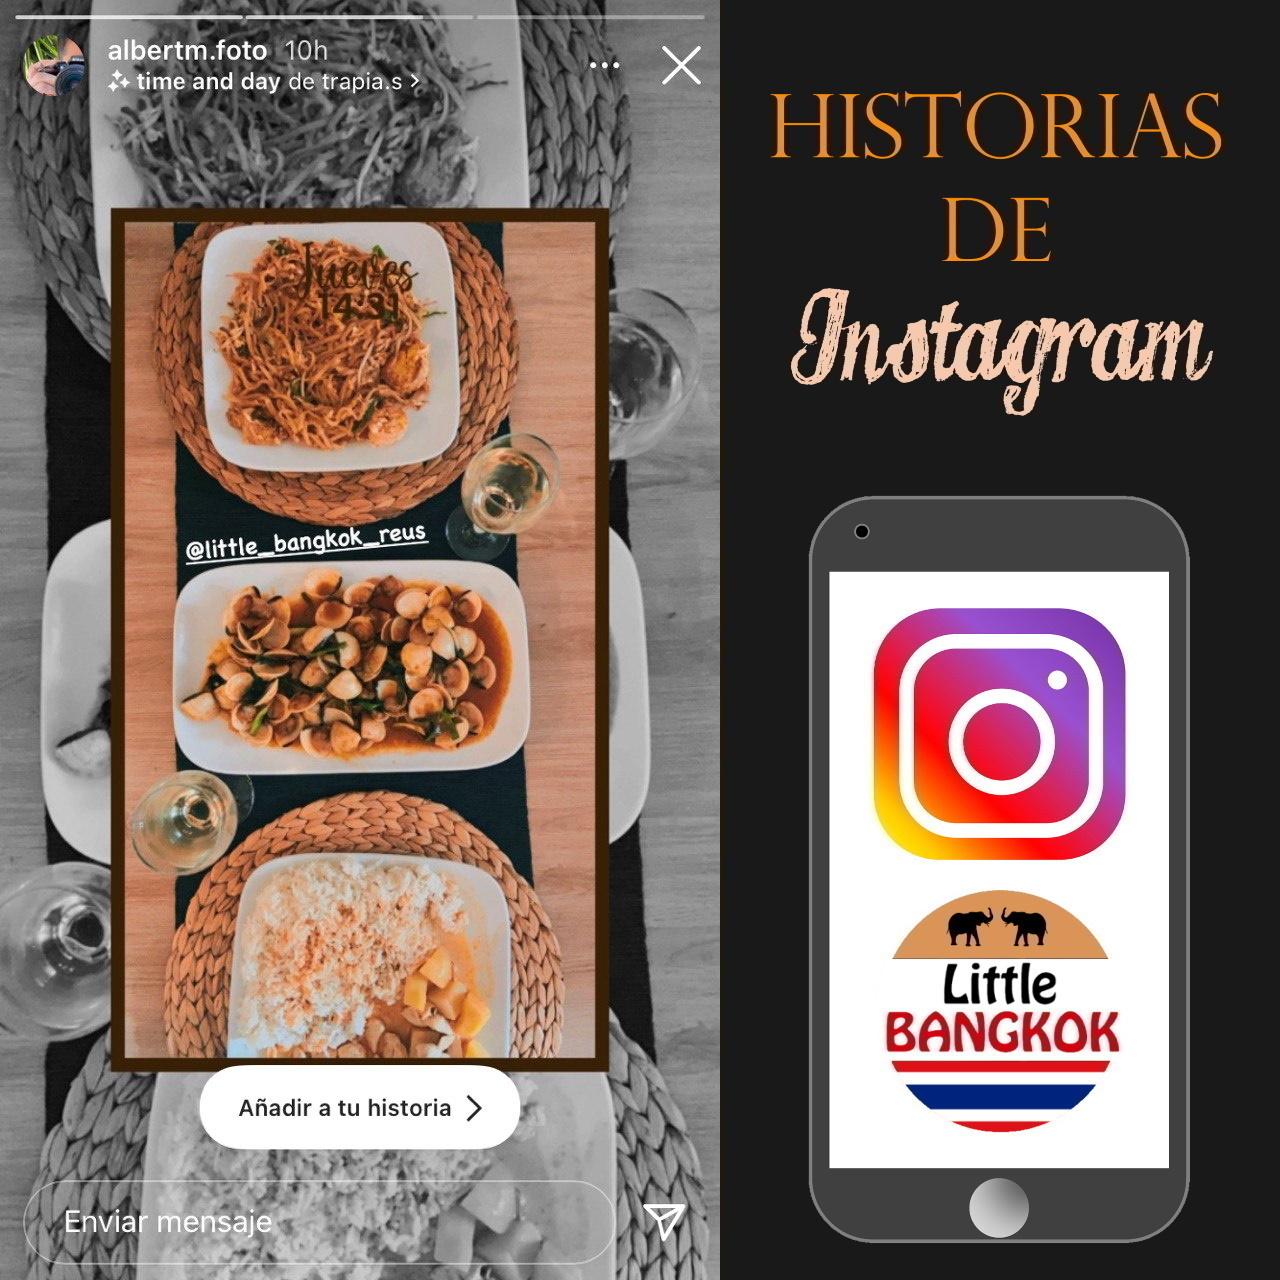 Historias de Instagram - 09 - Setembre 4